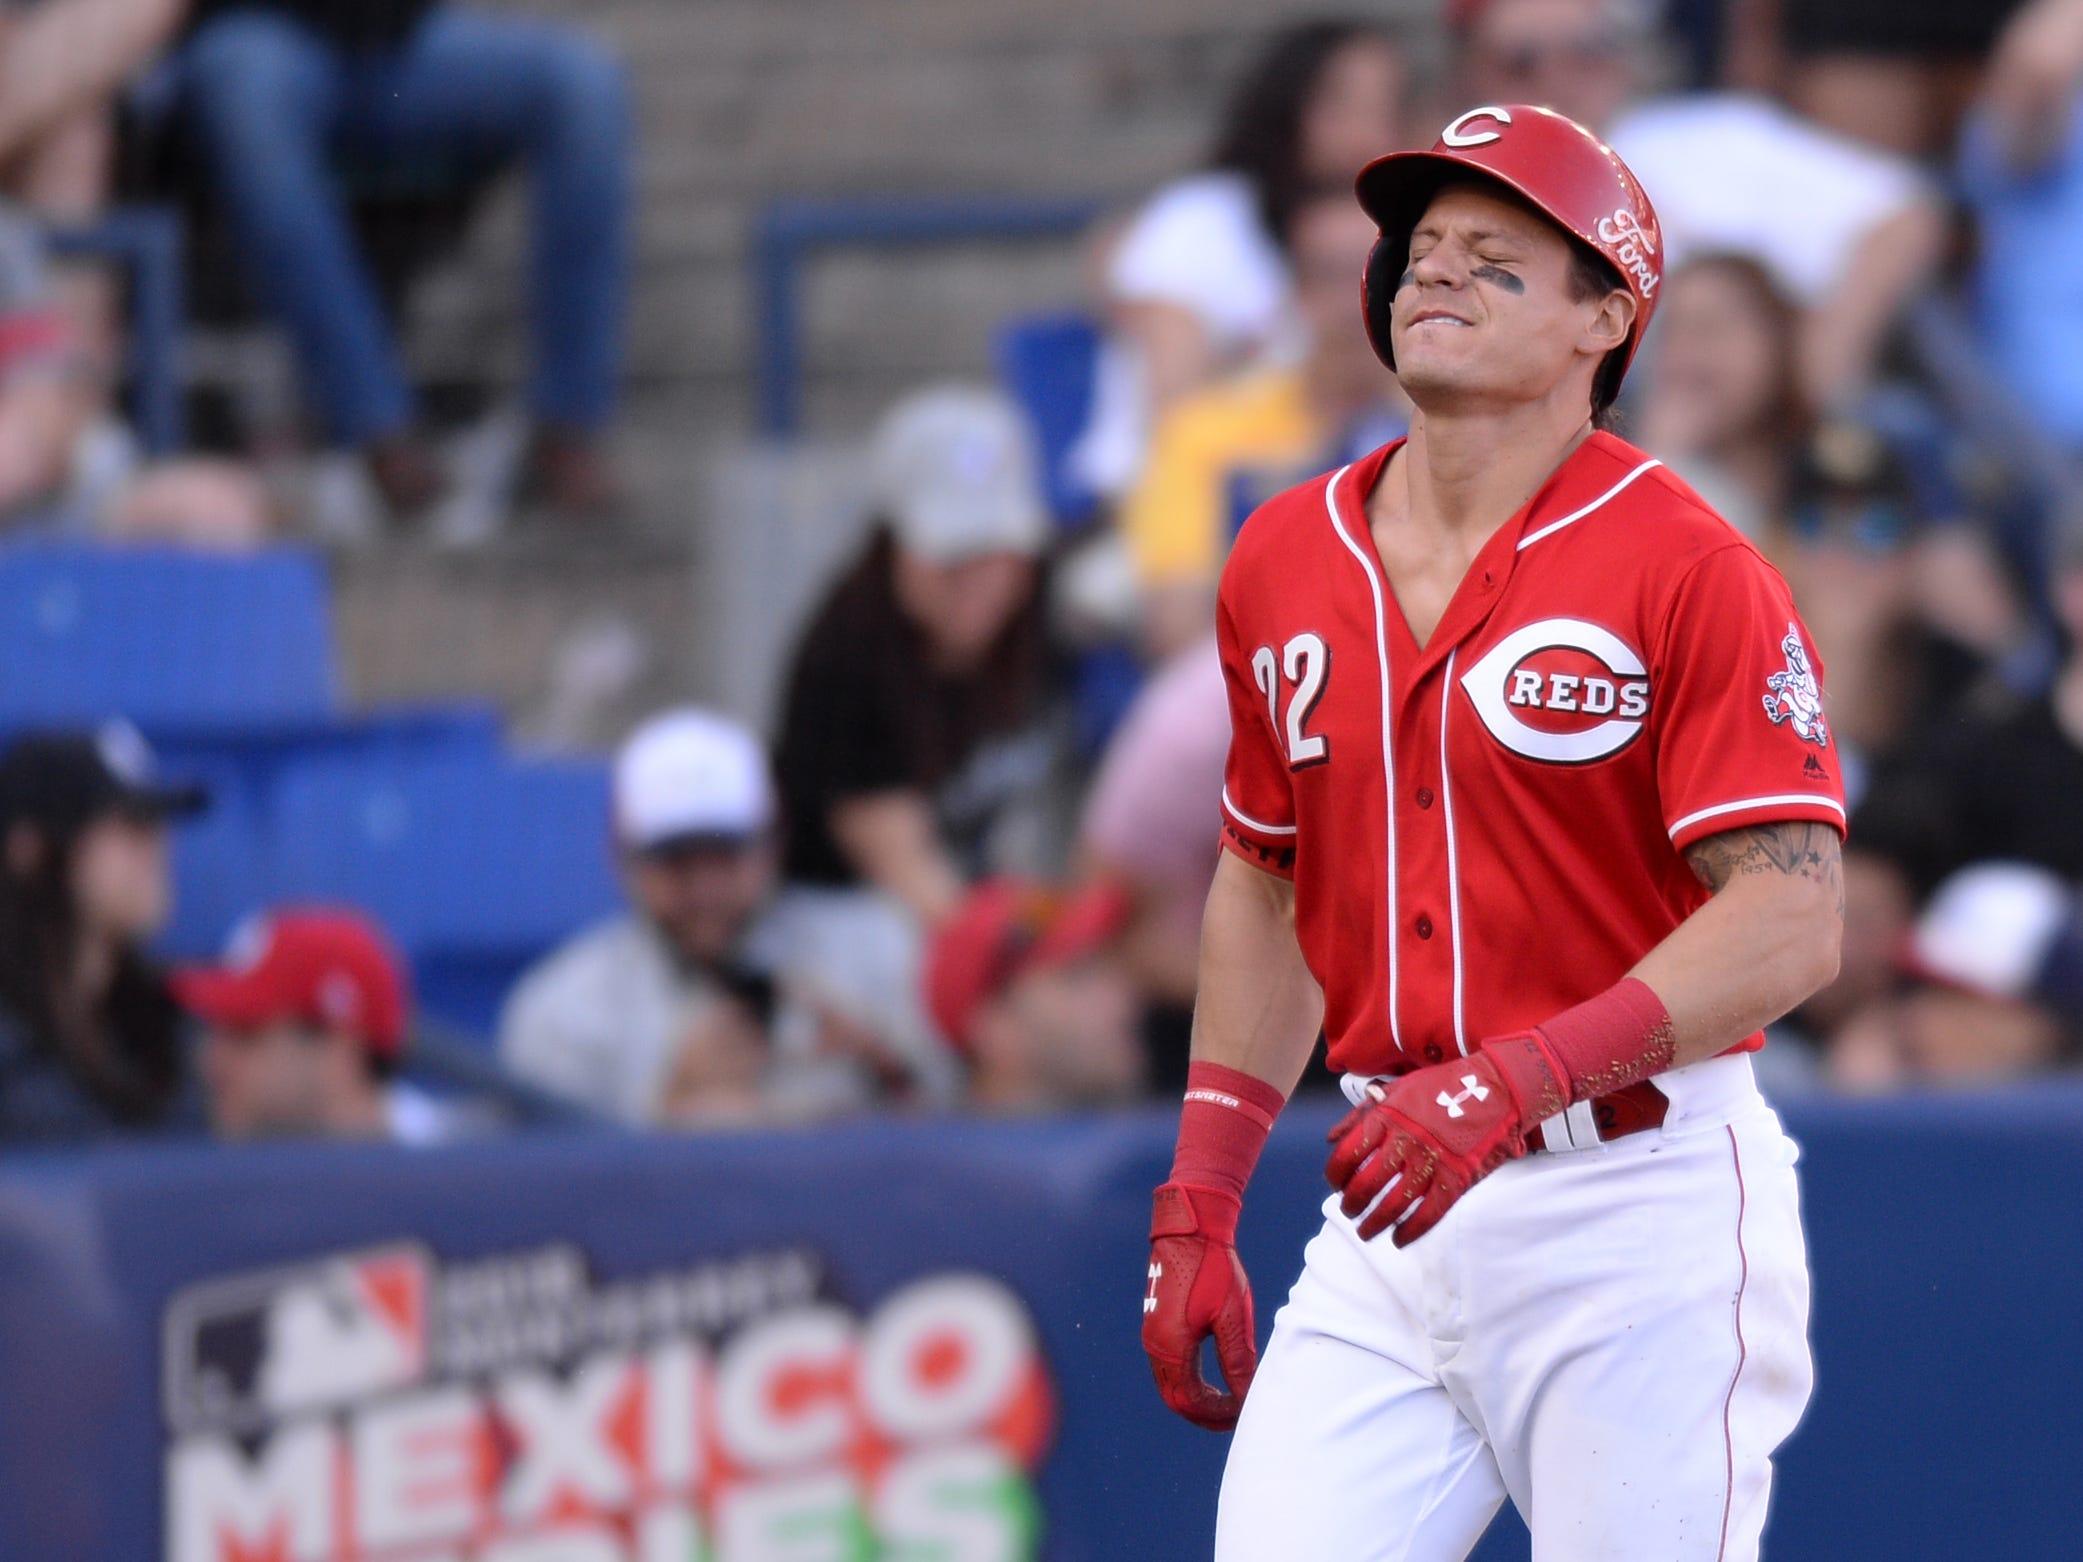 Cincinnati Reds second baseman Derek Dietrich (22) reacts after being hit by a pitch during the eight inning against the St. Louis Cardinals at Estadio de Beisbol Monterrey.